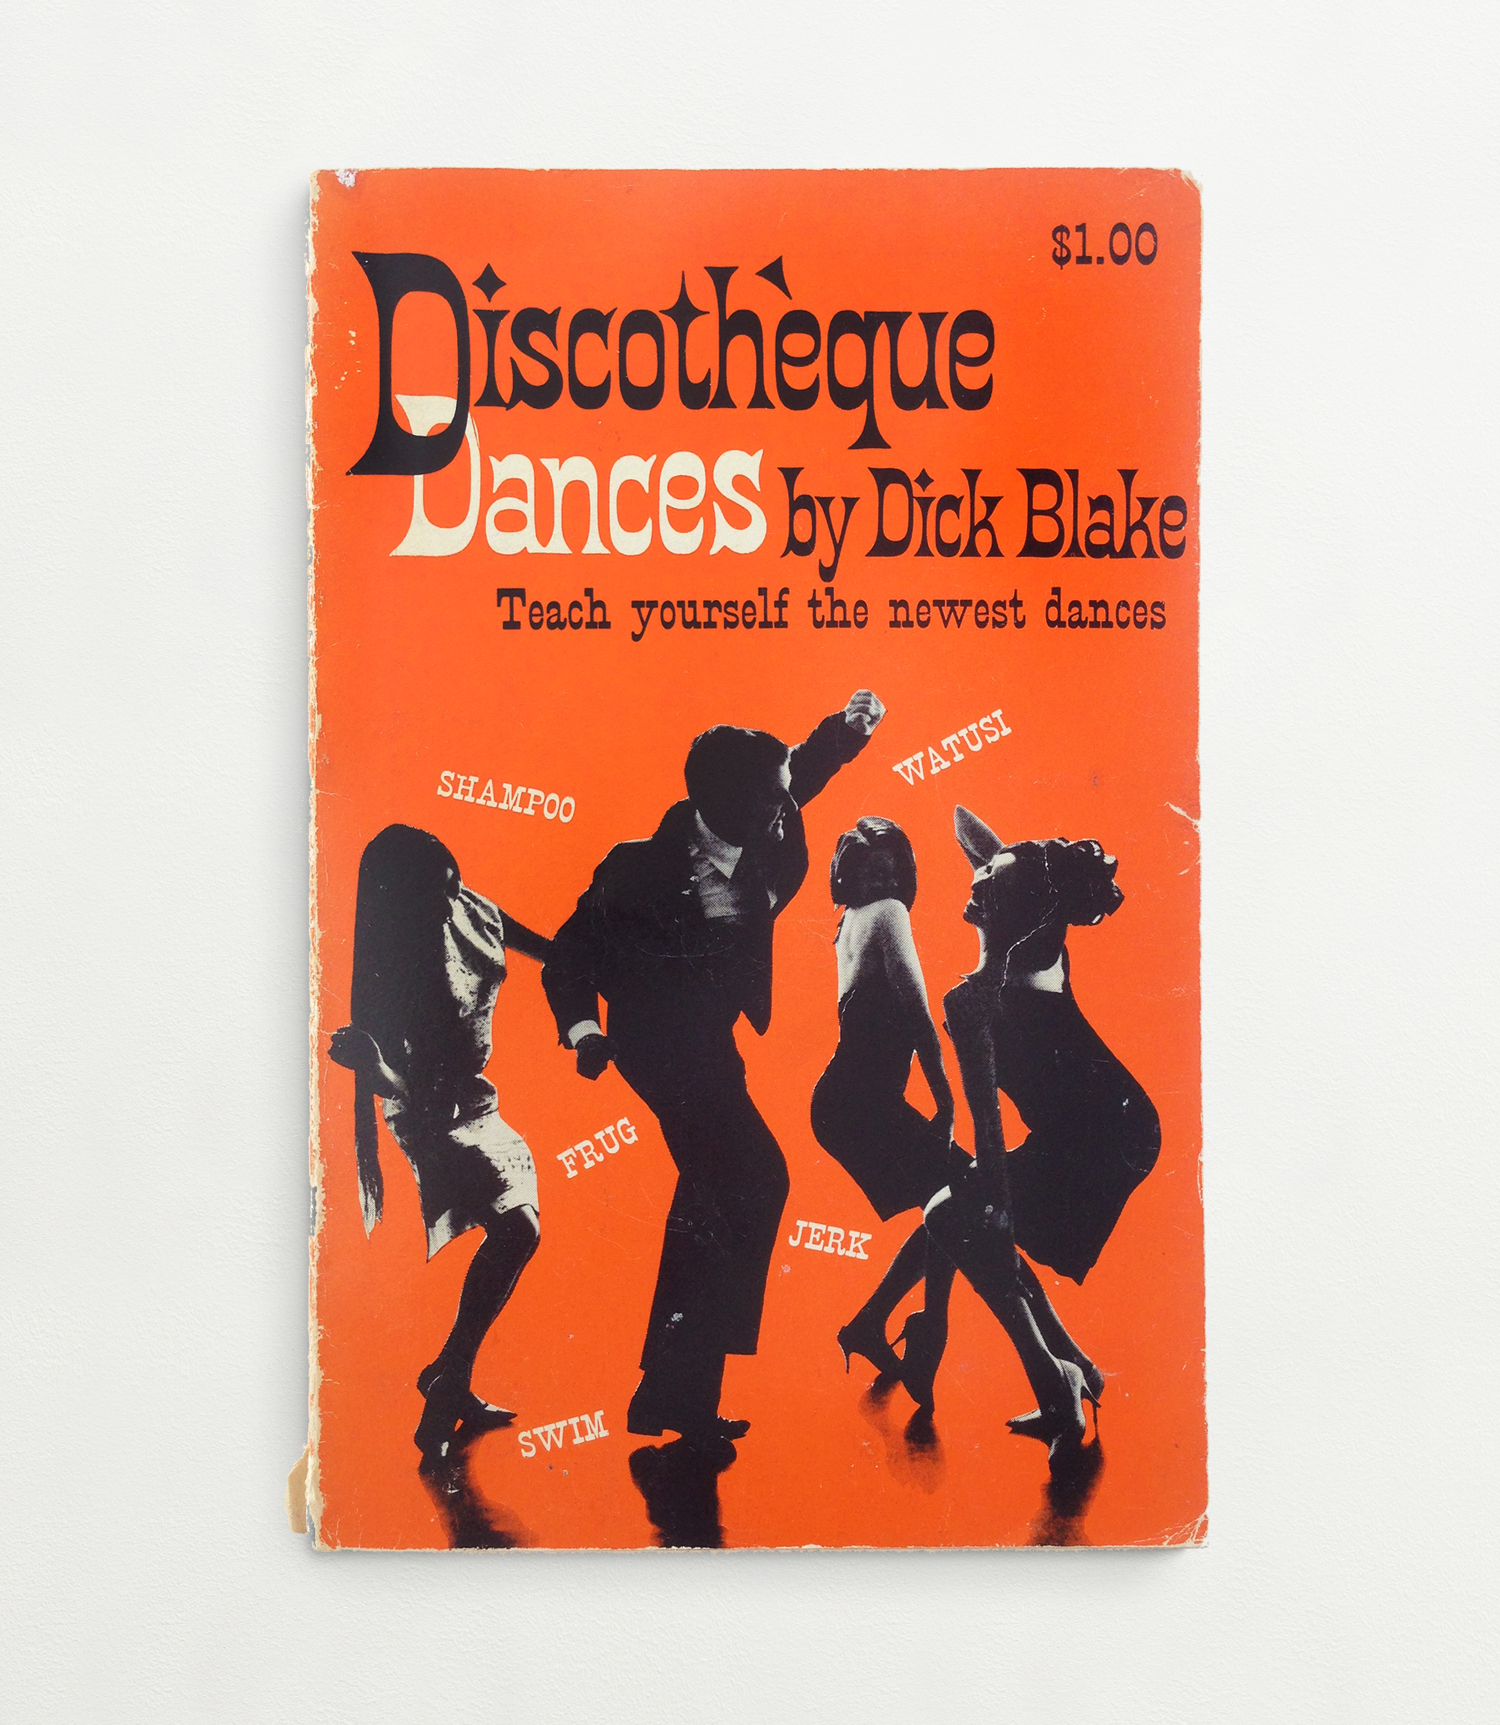 discothequedances.jpg